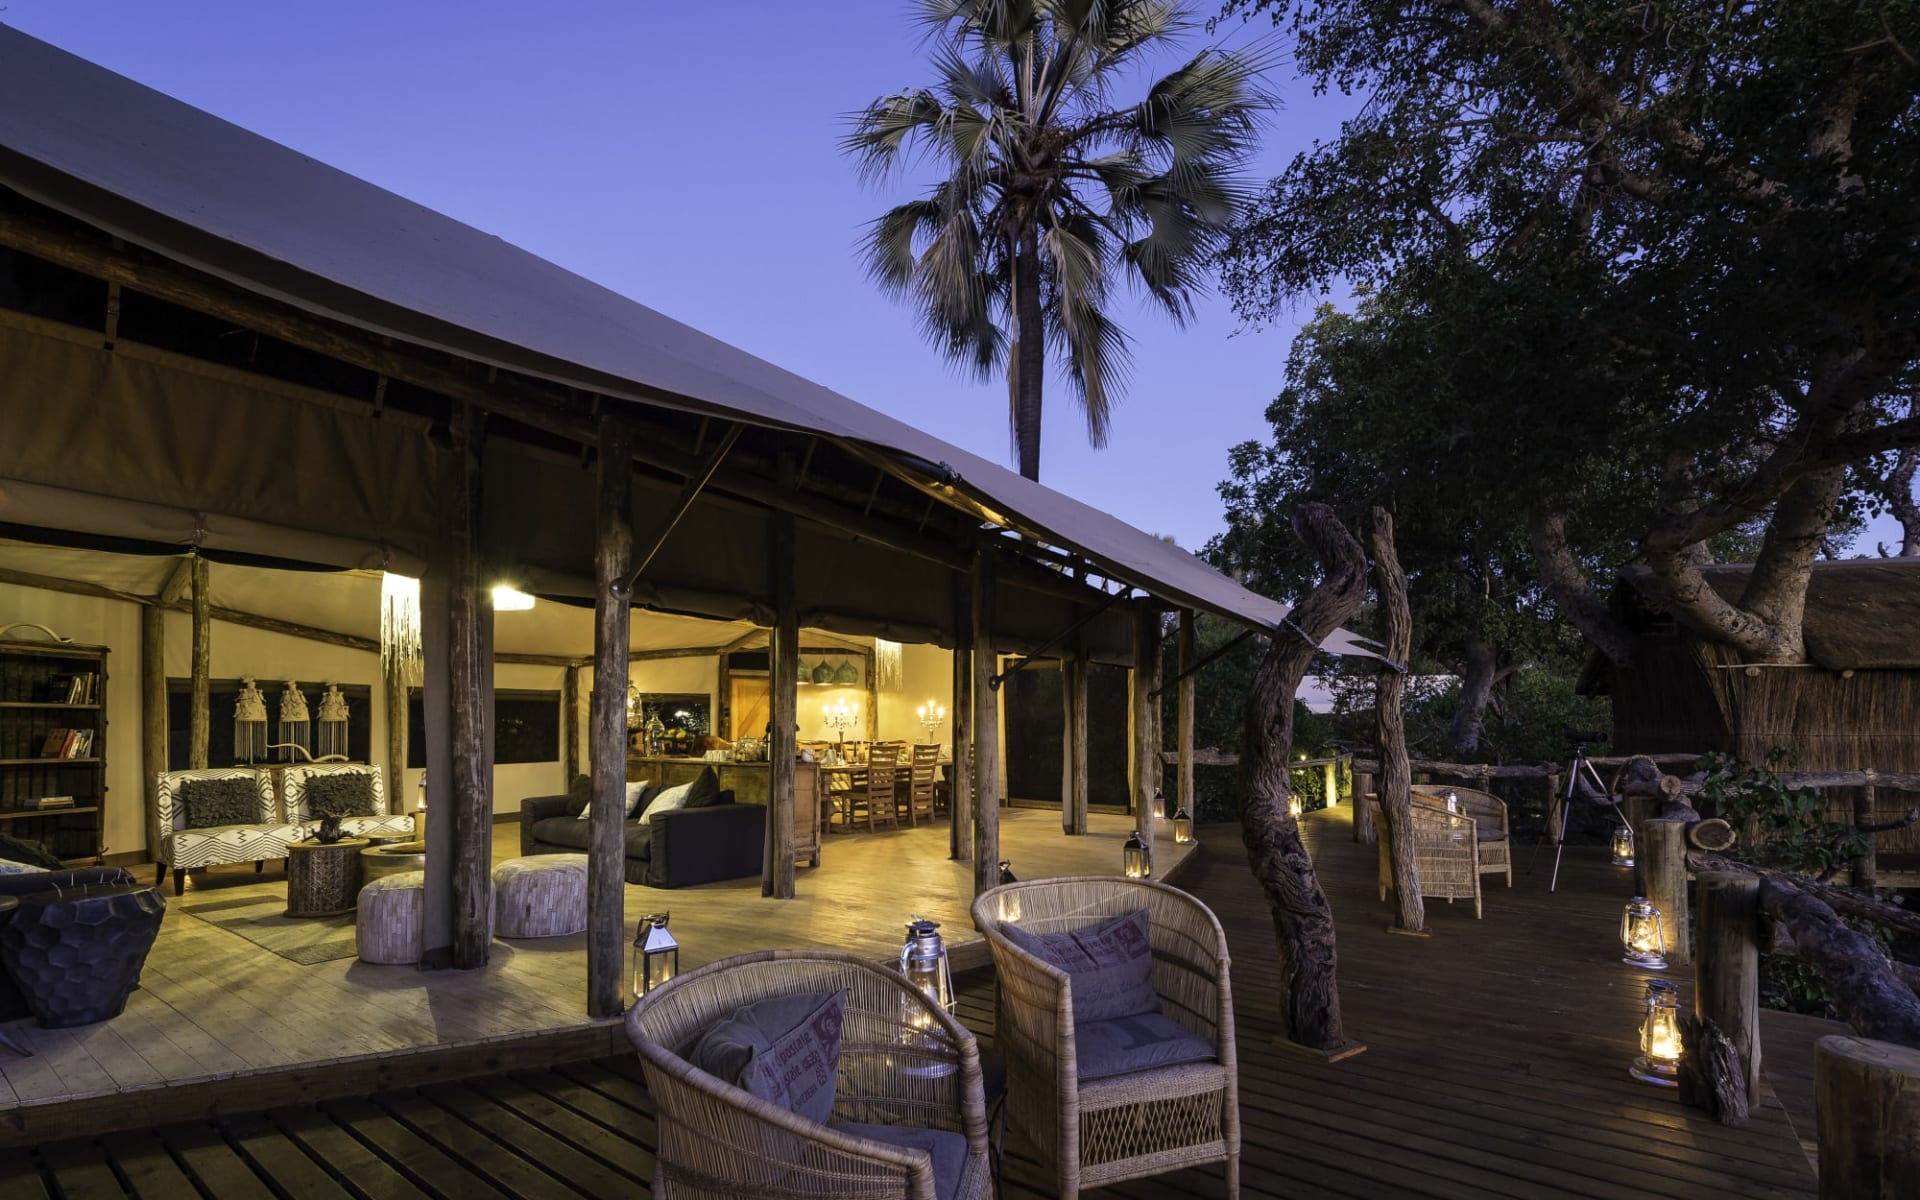 Little Tubu Camp in Okavango Delta:  Little Tubu Camp